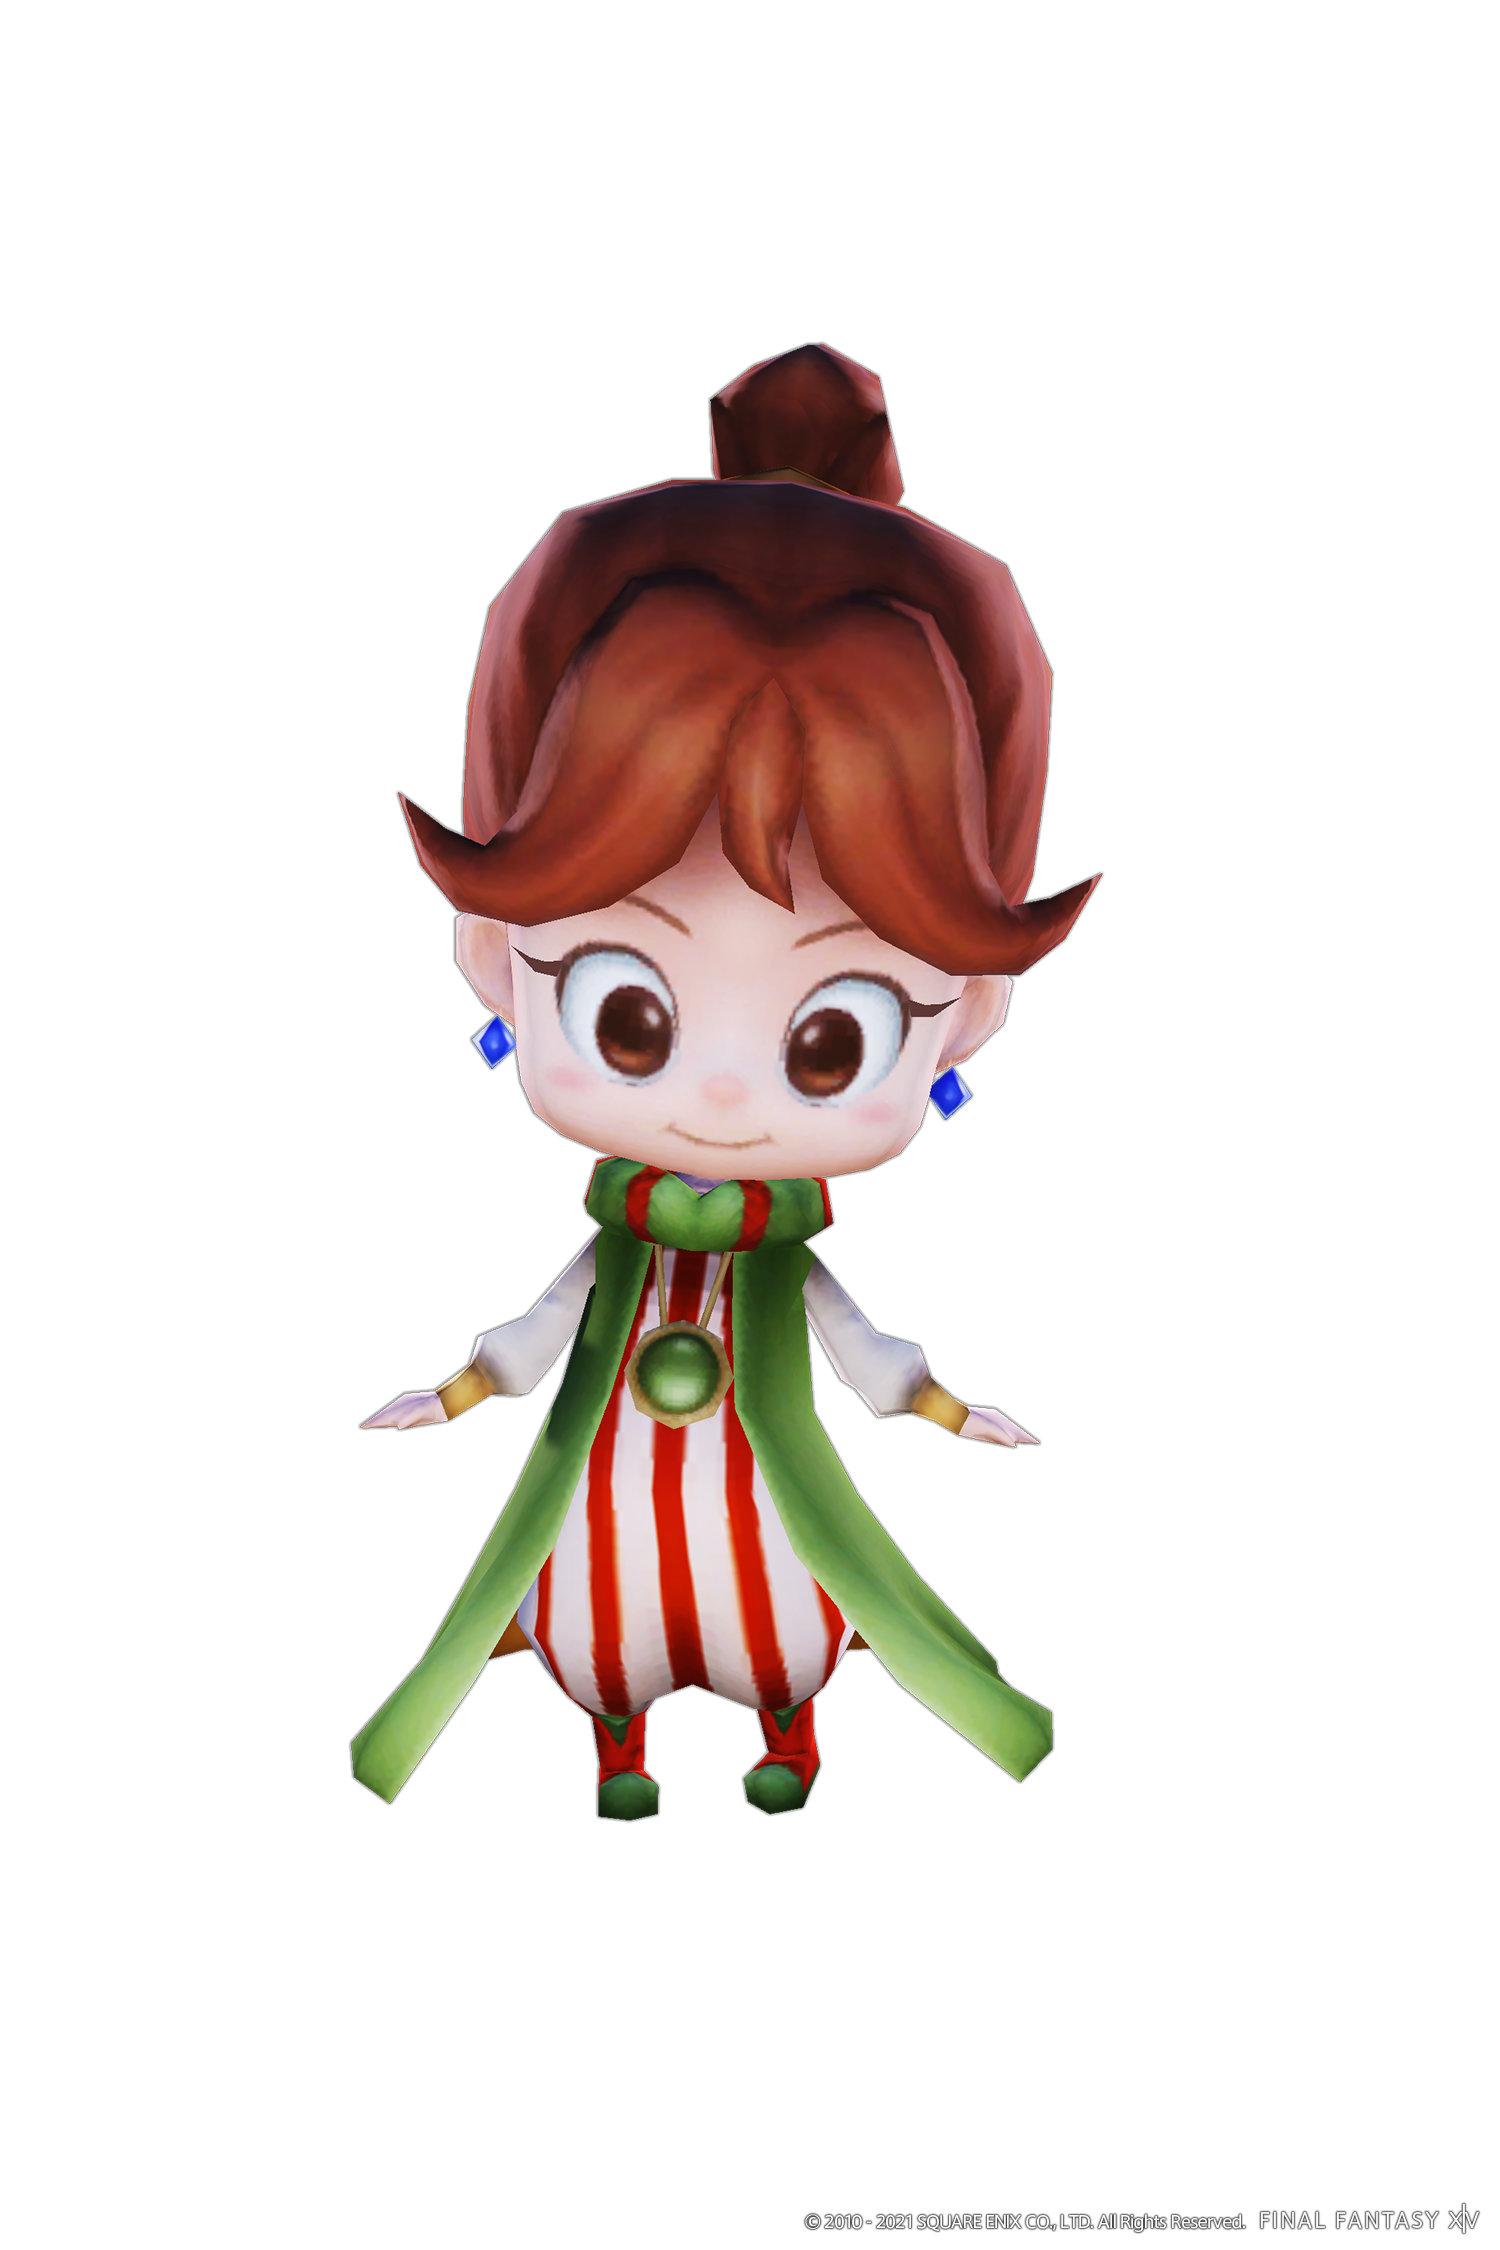 Final Fantasy XIV Preorder Wind-Up Porom Minion